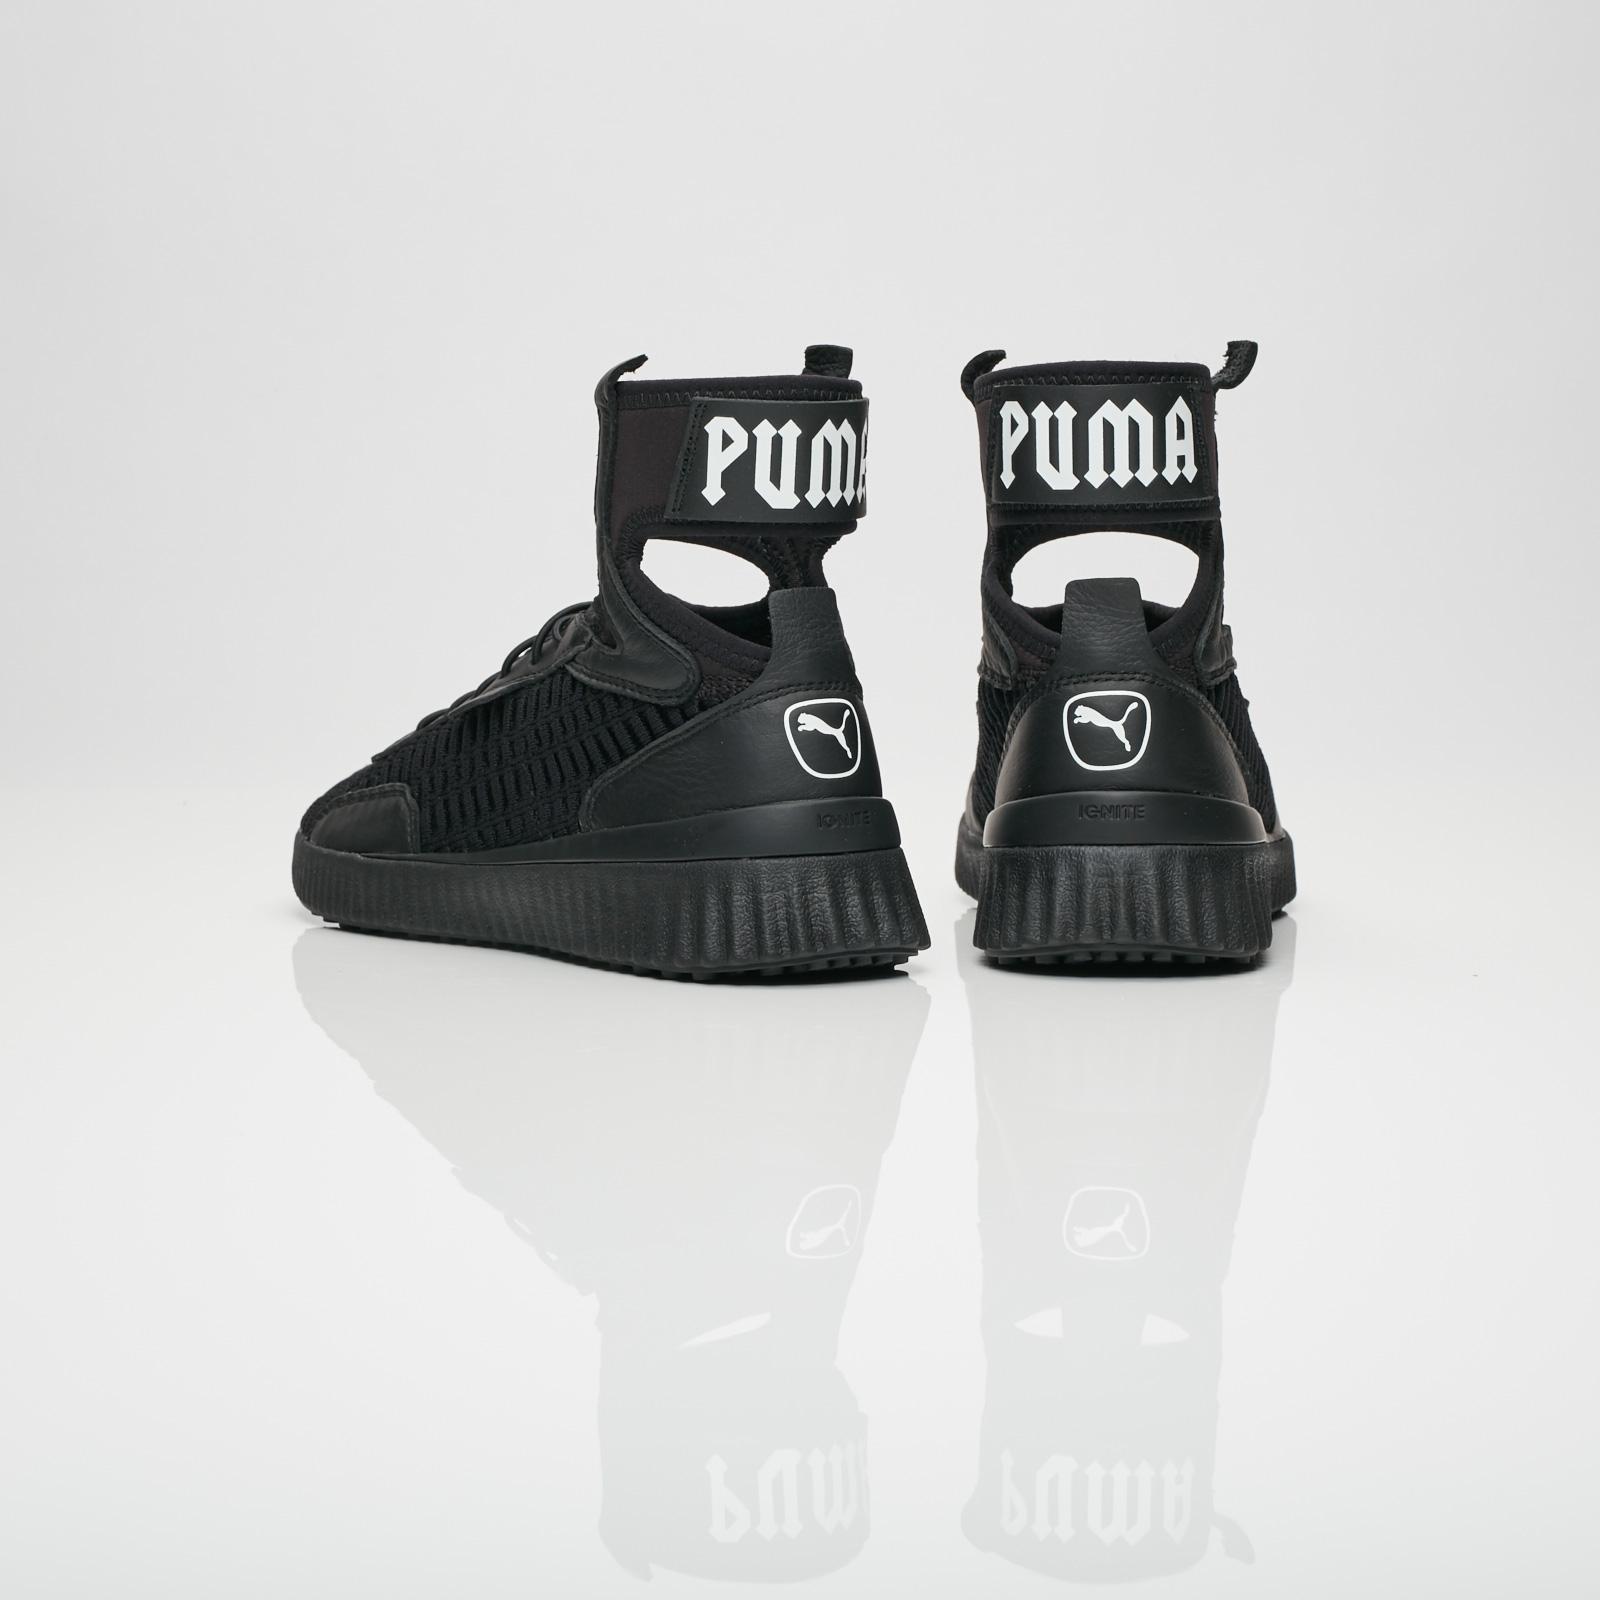 quality design 9035b 62fe5 Puma Fenty Trainer Mid - 190938-01 - Sneakersnstuff ...